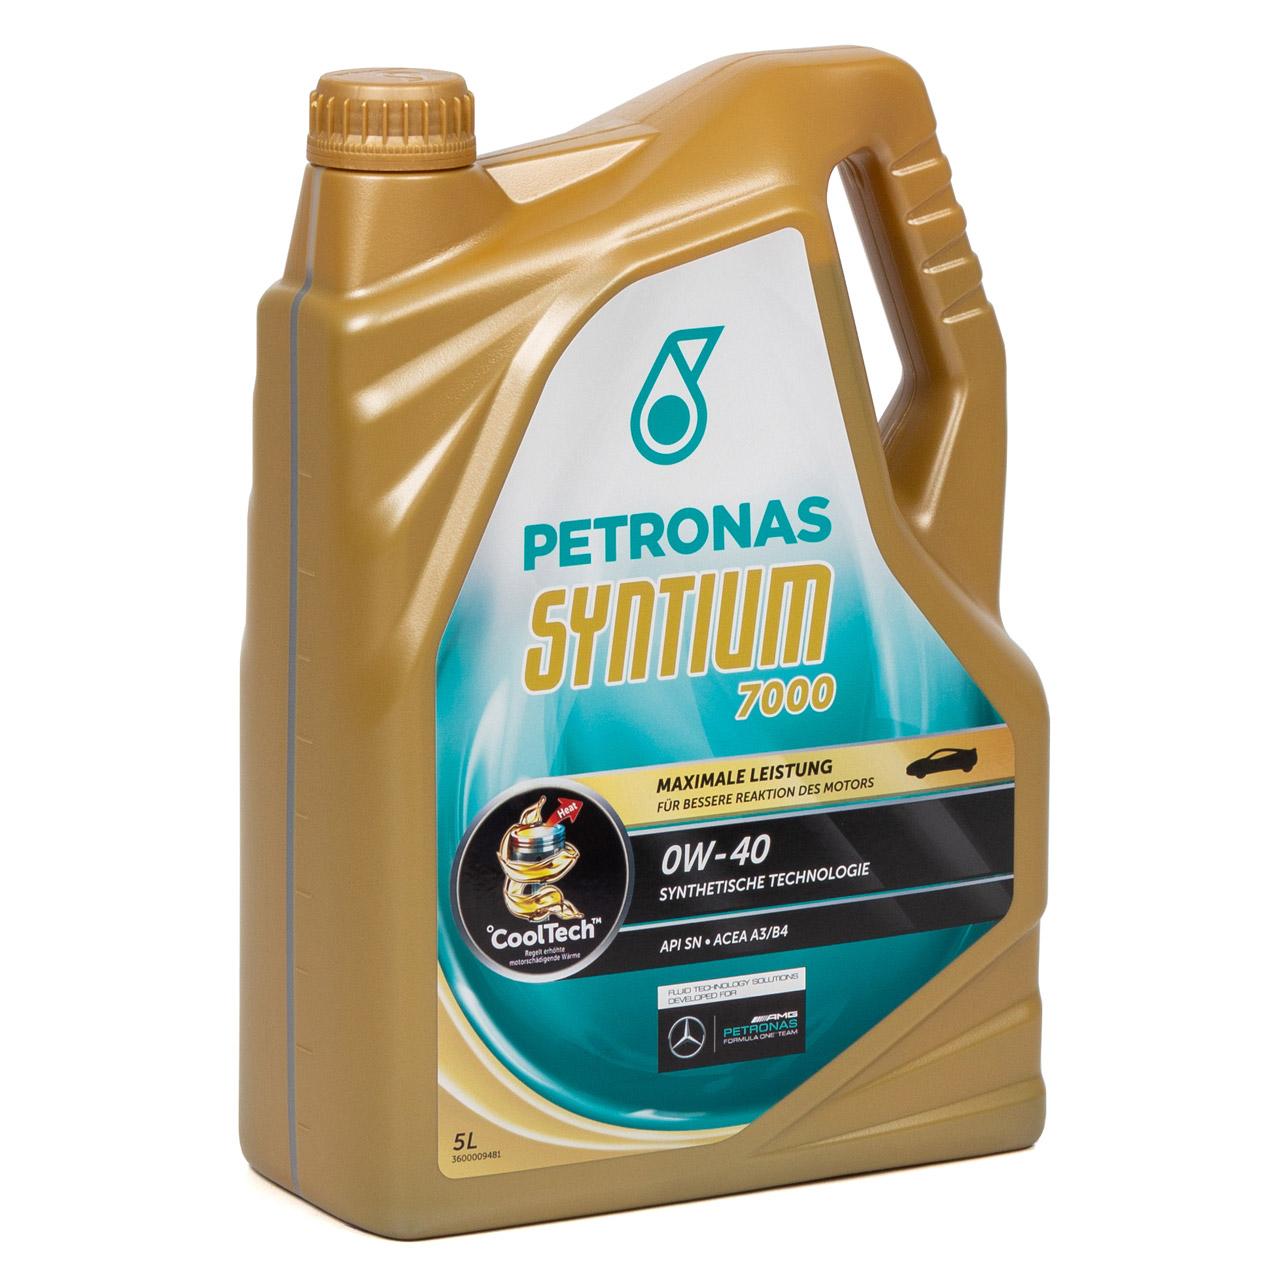 PETRONAS SYNTIUM 7000 Motoröl Öl 0W-40 0W40 MB 229.5 VW 502/505.00 - 5L 5 Liter